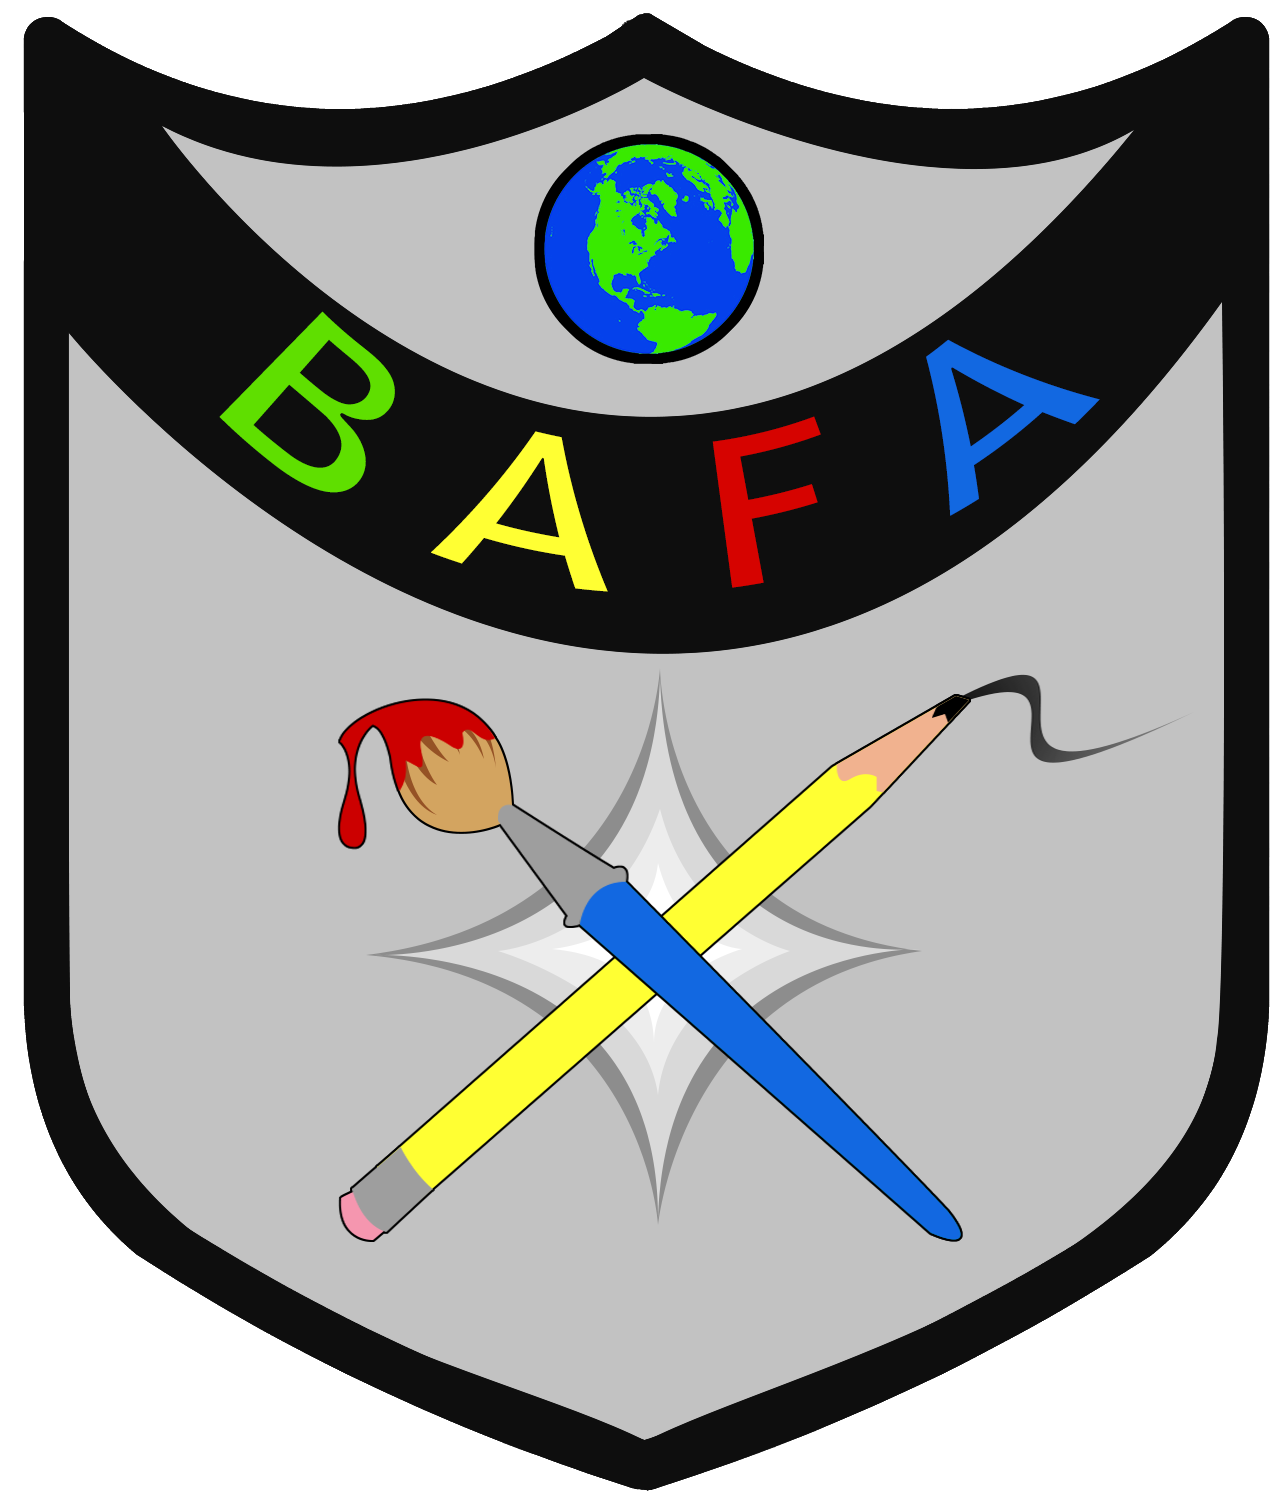 BAFA logo contest entry